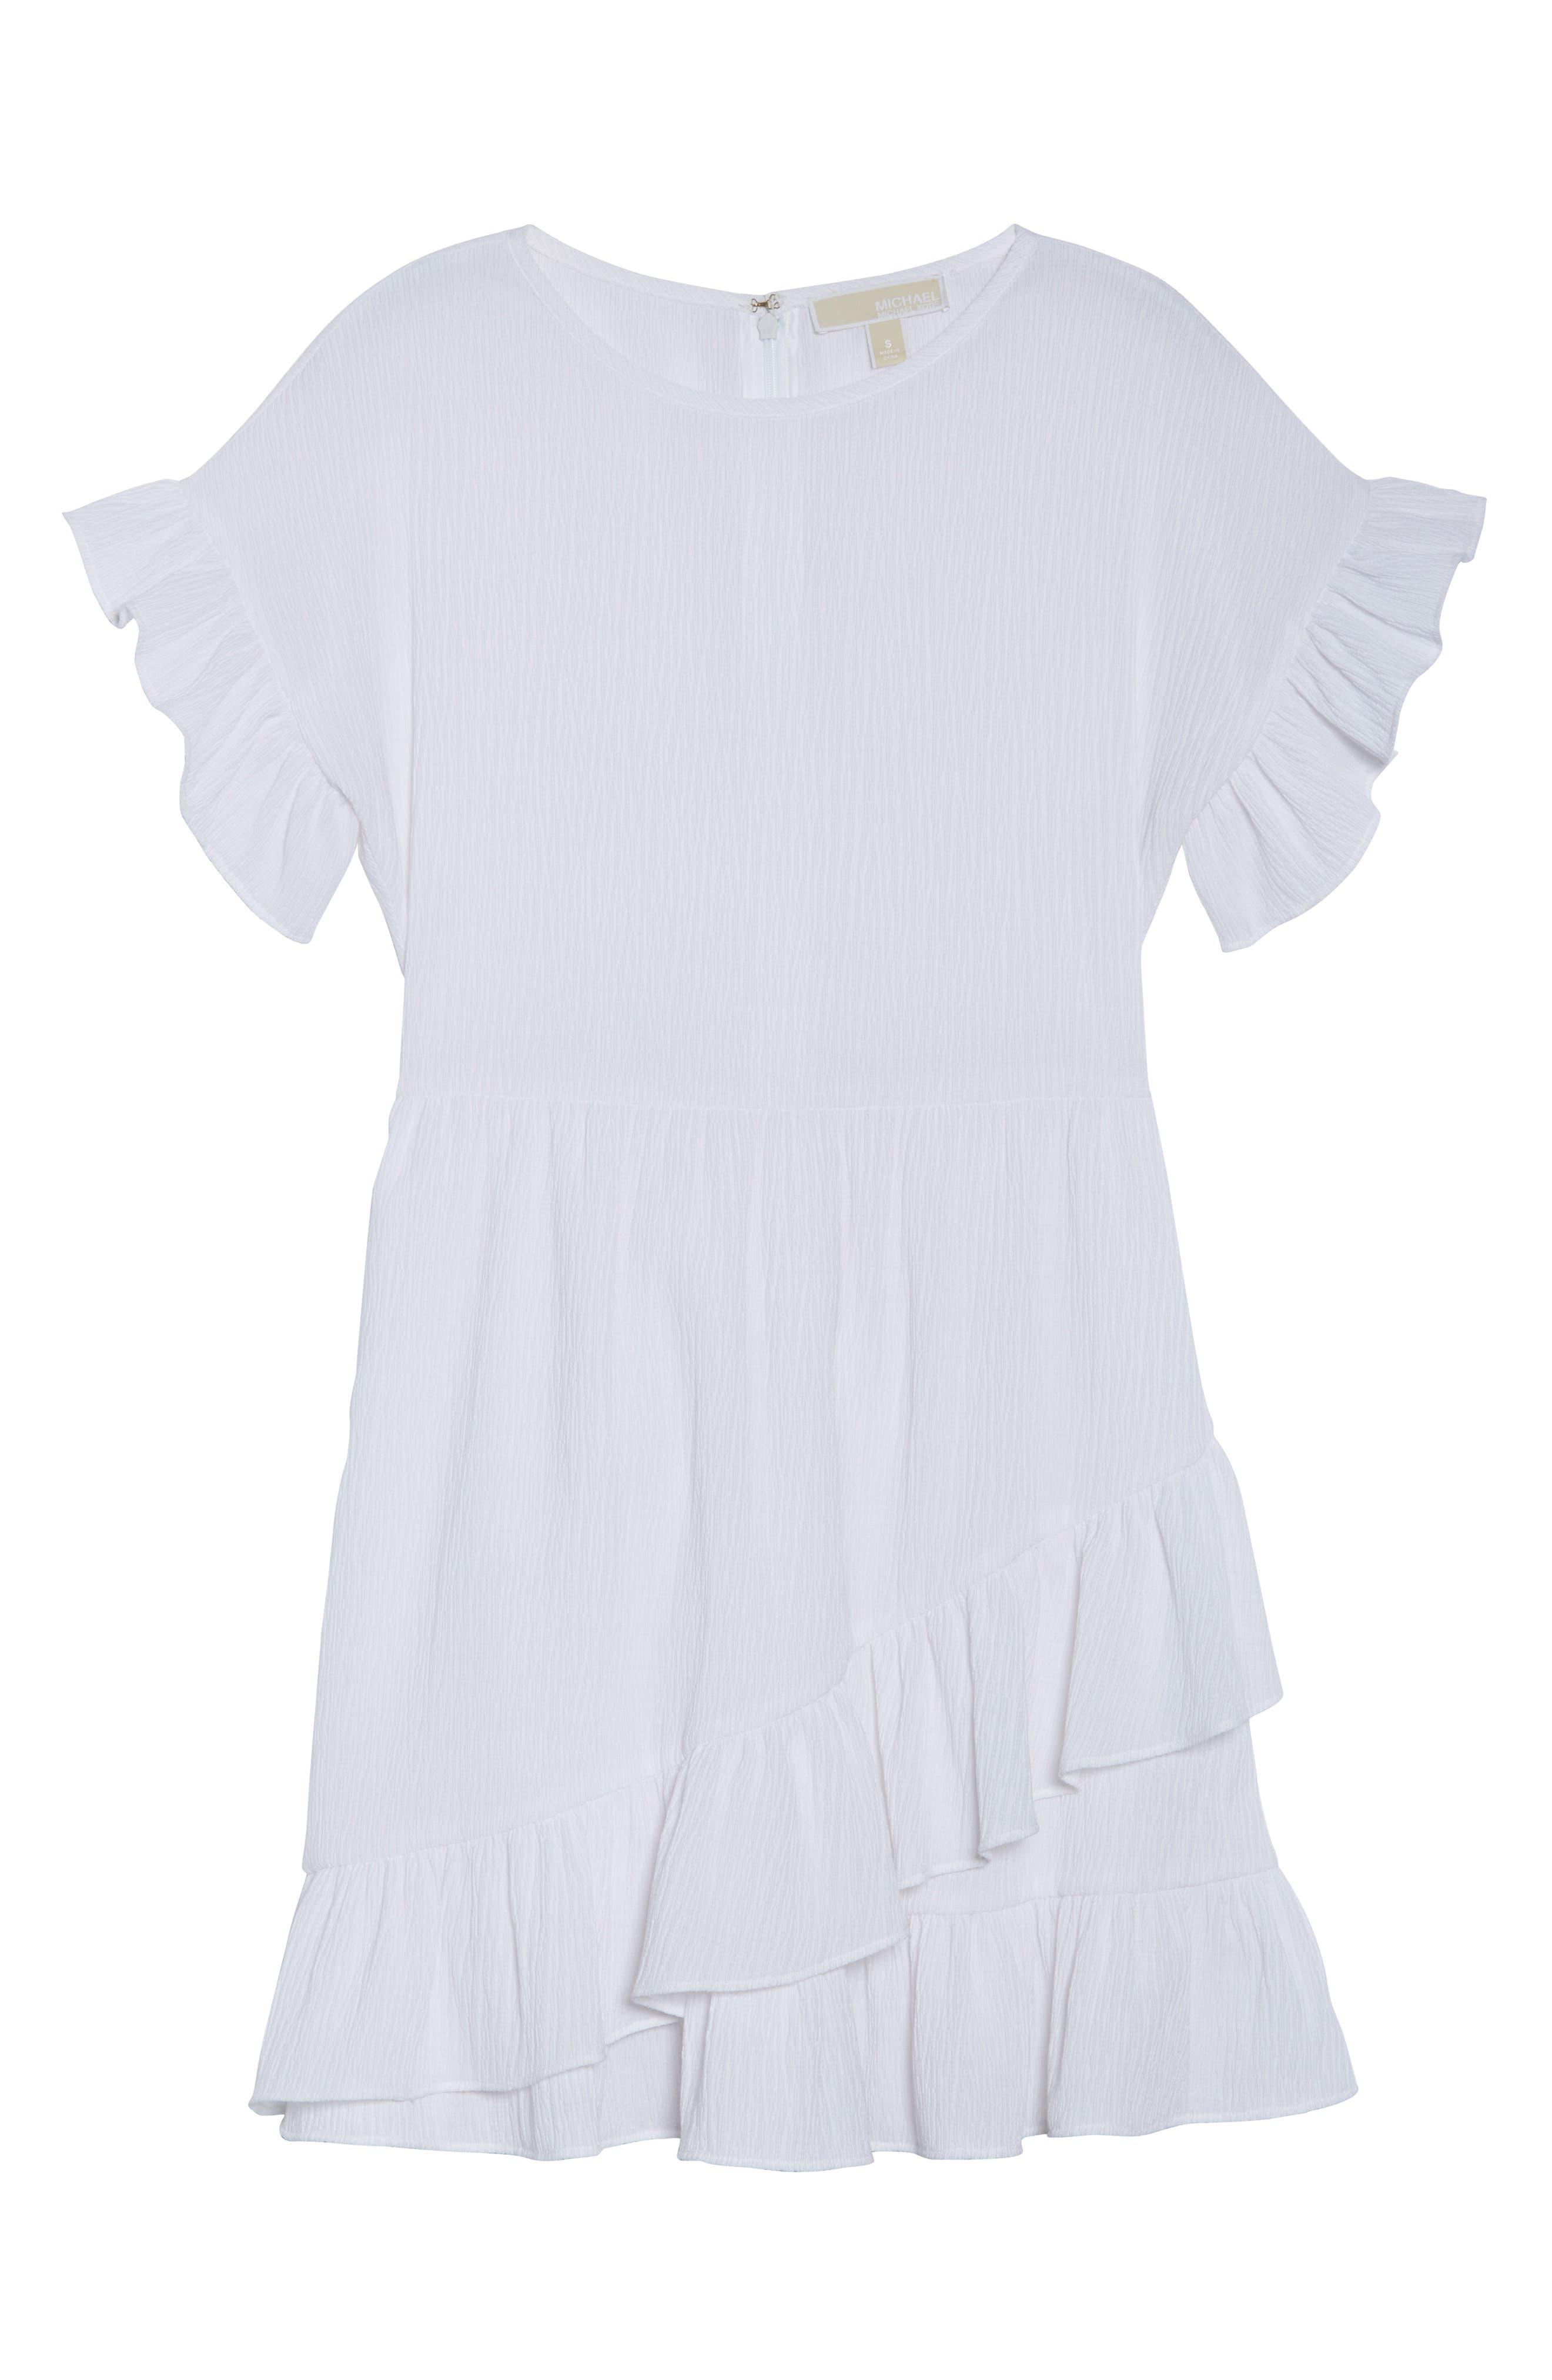 Ruffle Dress,                             Alternate thumbnail 7, color,                             White